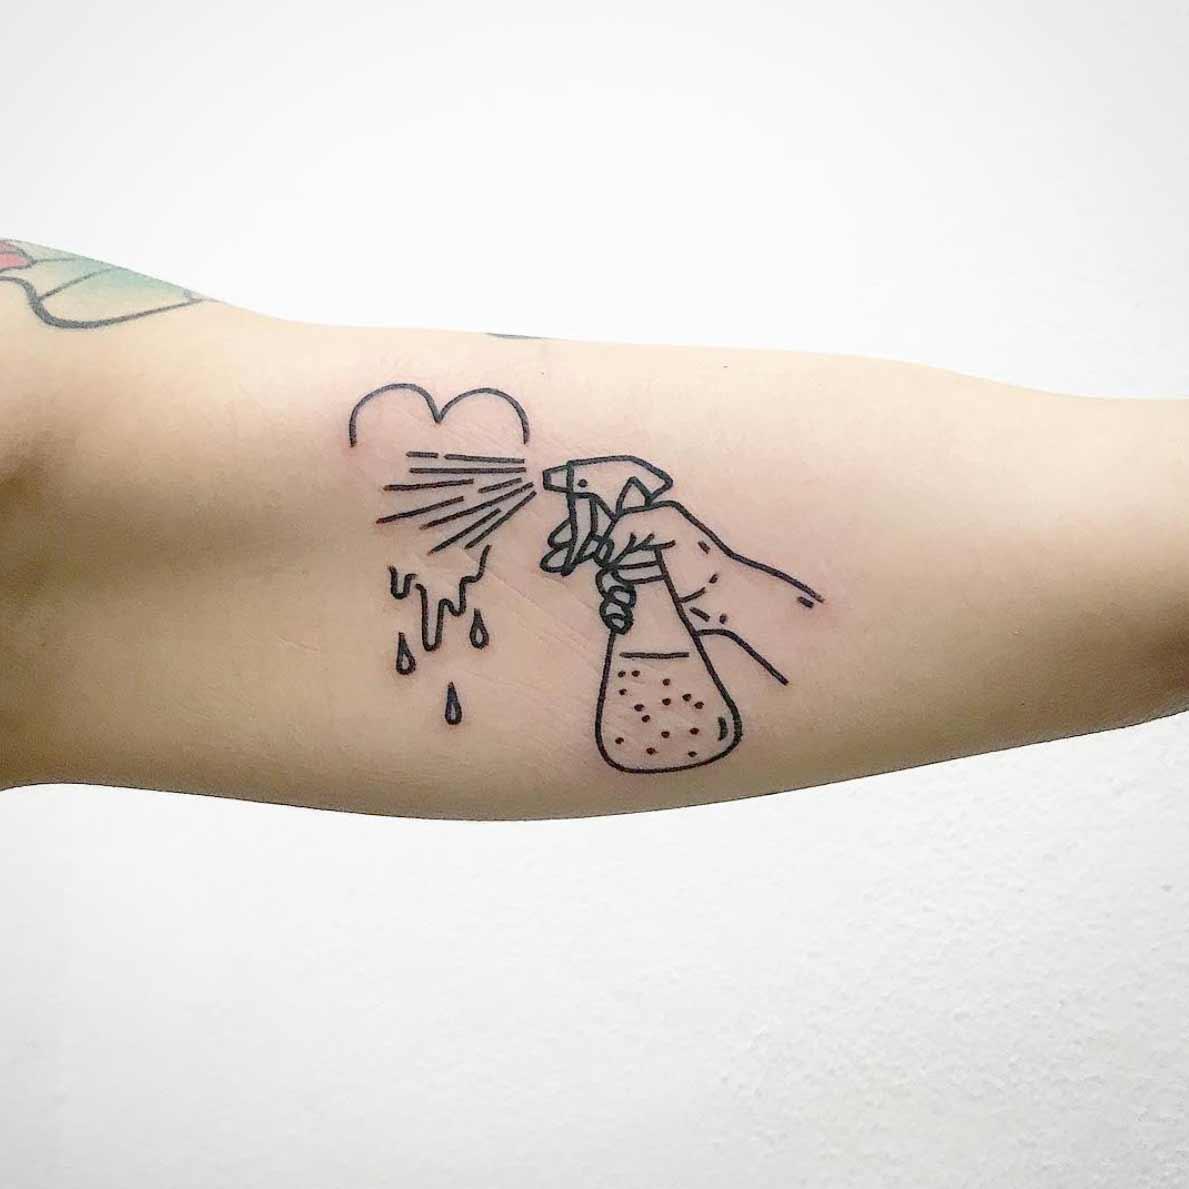 Sarkastische Tattoos von The Magic Rosa The-magic-rosa-tattoos-berlin_11